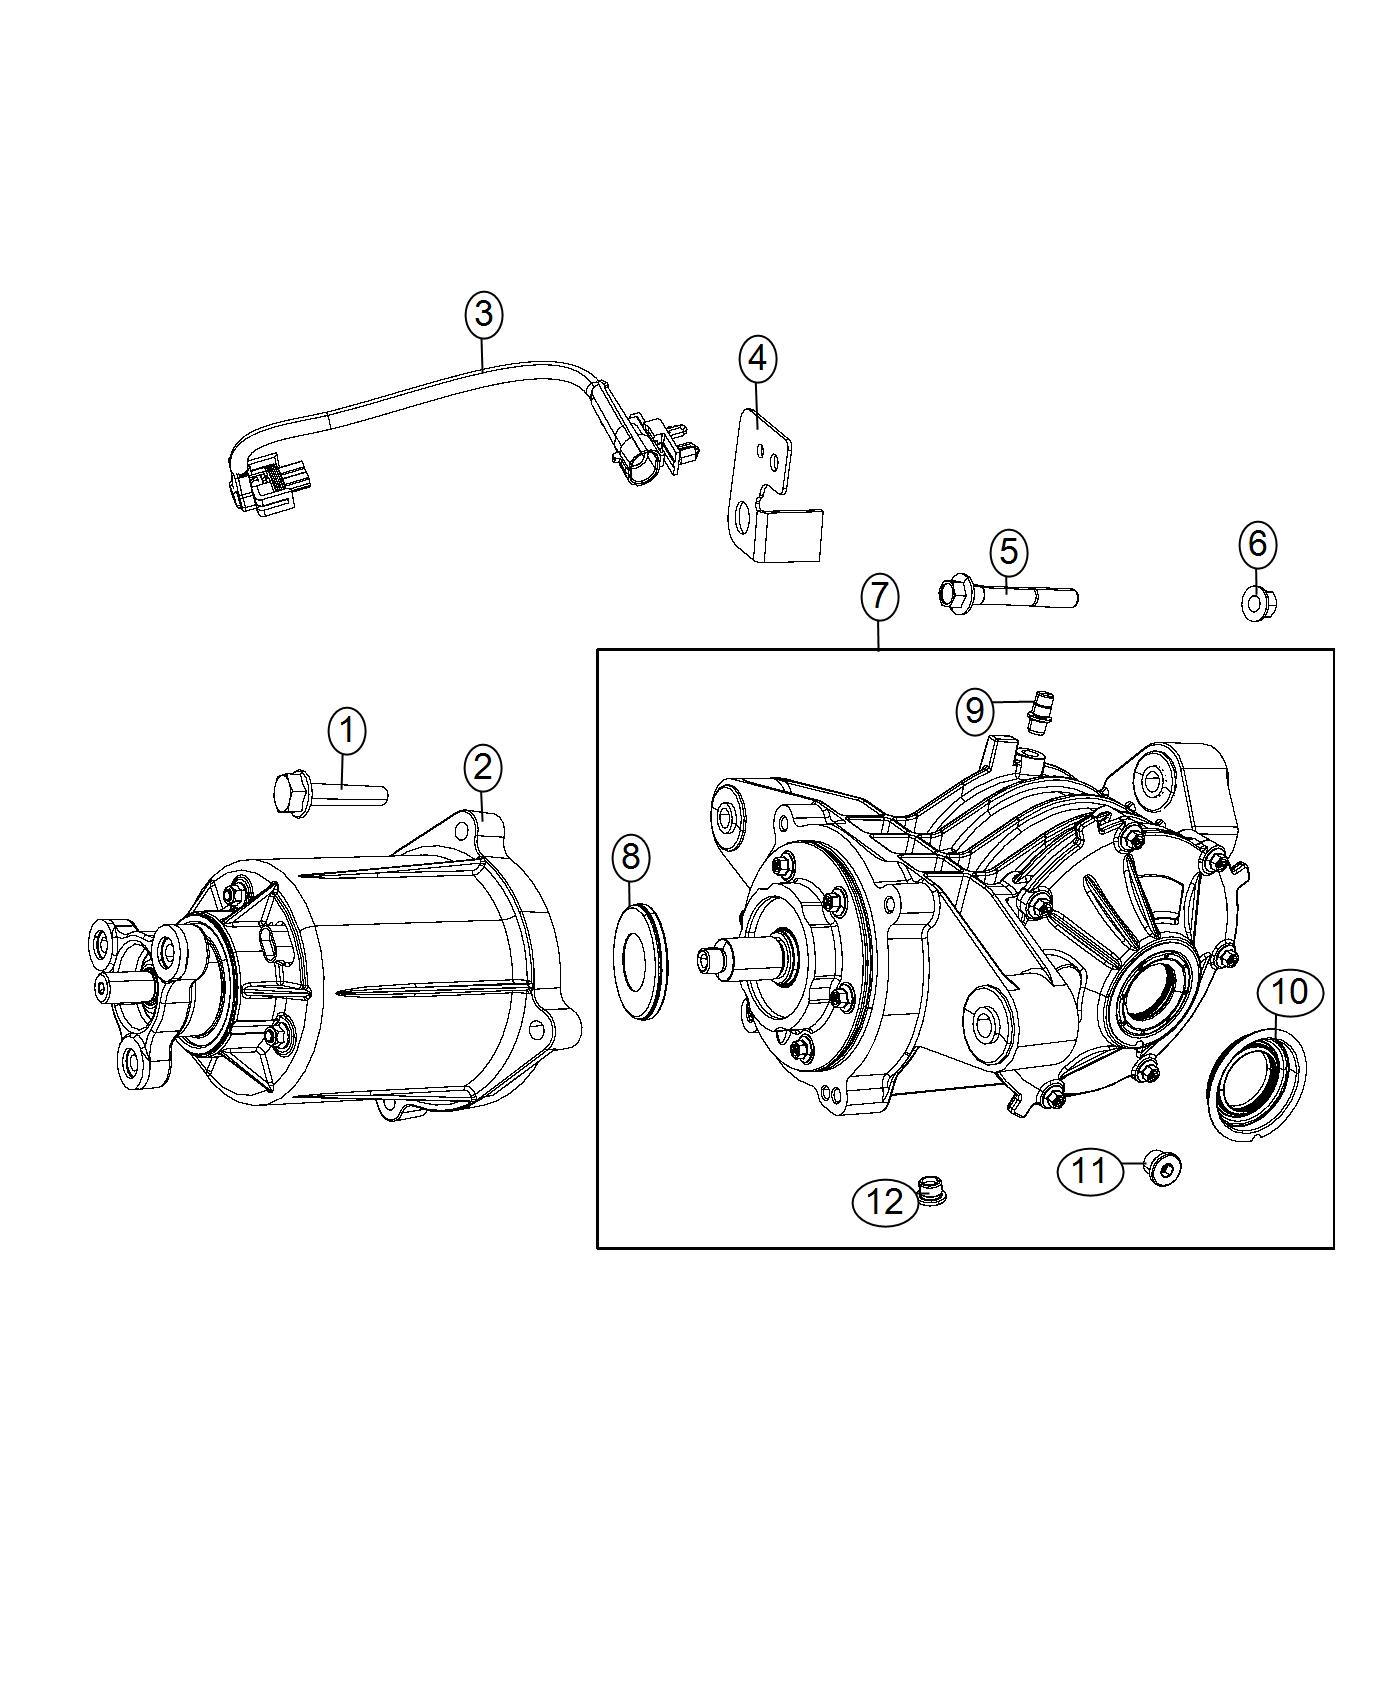 2008 Chrysler Sebring Differential. Rear axle. Suspension